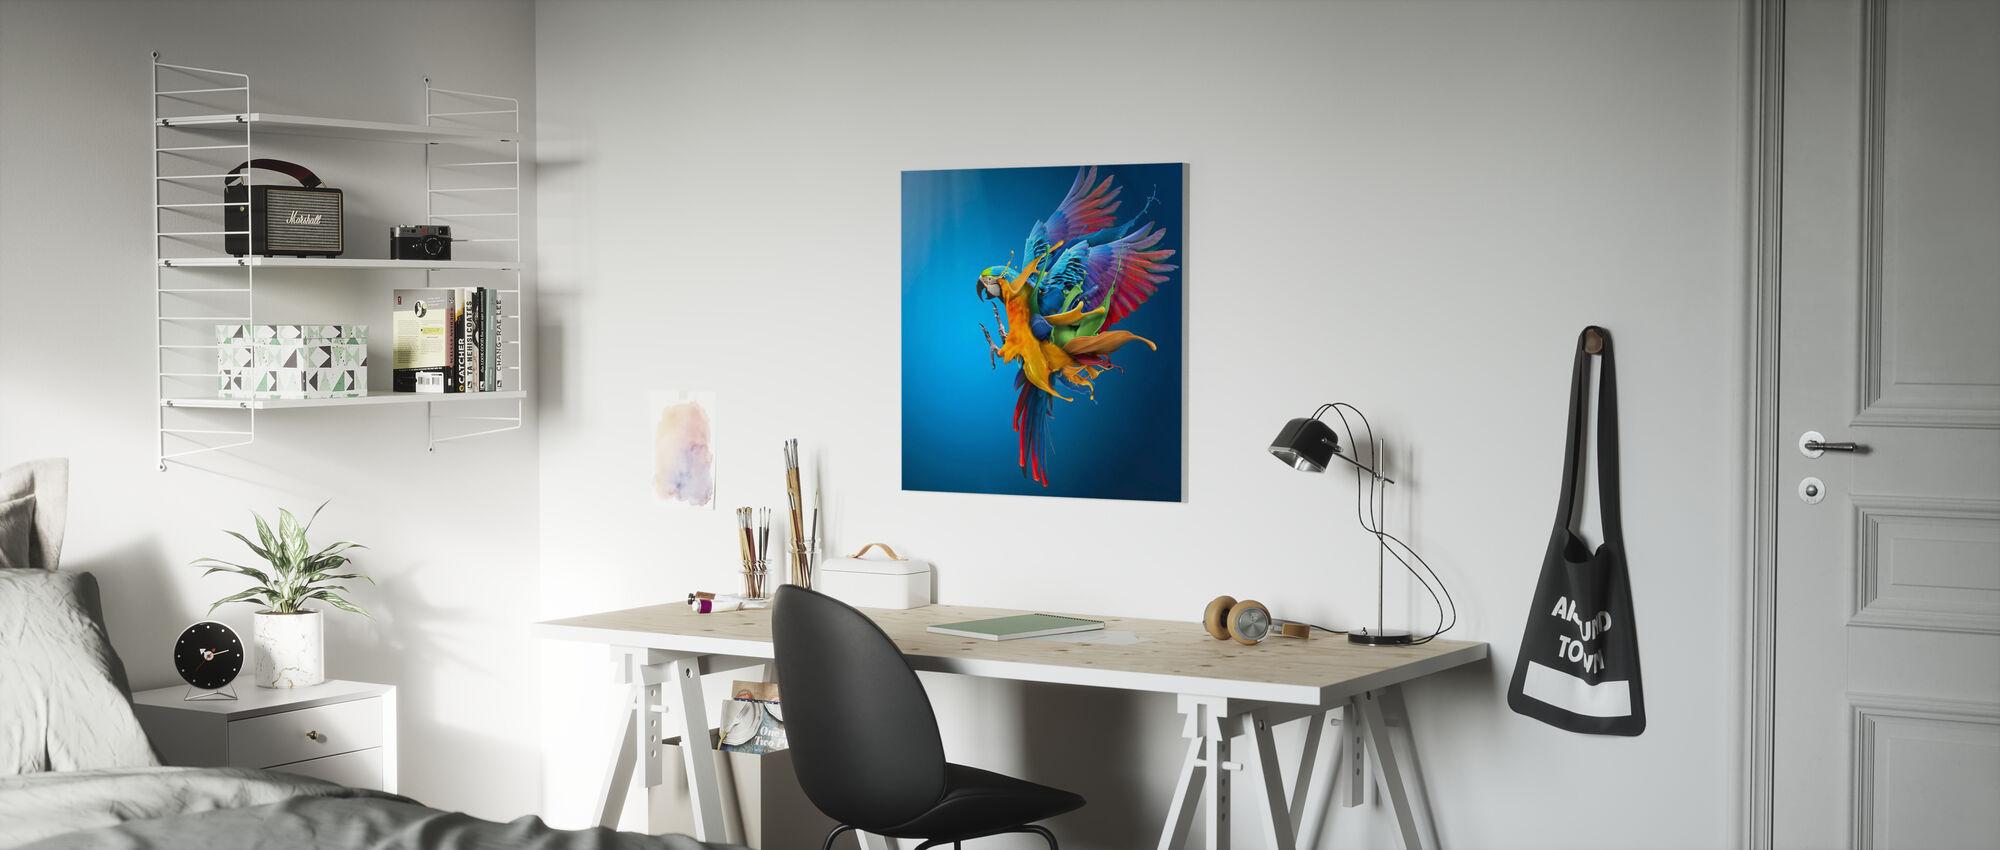 Vliegende kleuren - Canvas print - Kinderkamer